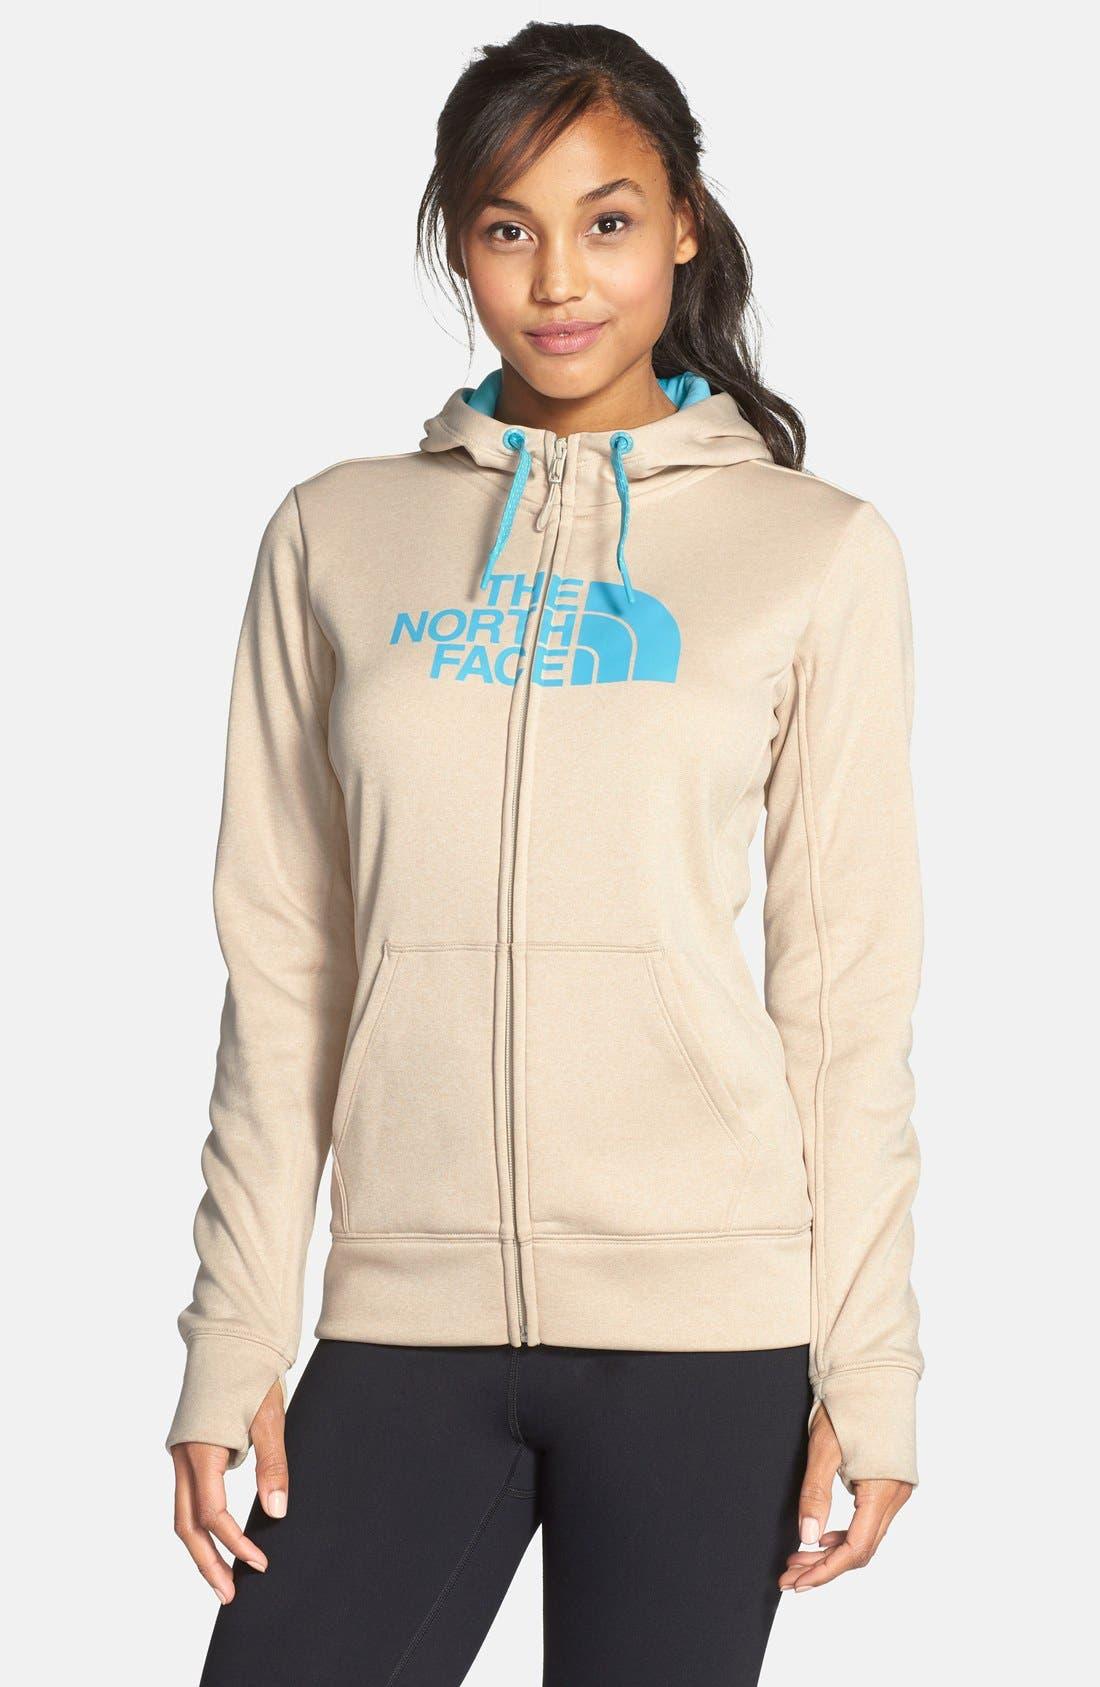 Main Image - The North Face 'Half Dome' Full Zip Fleece Hoodie